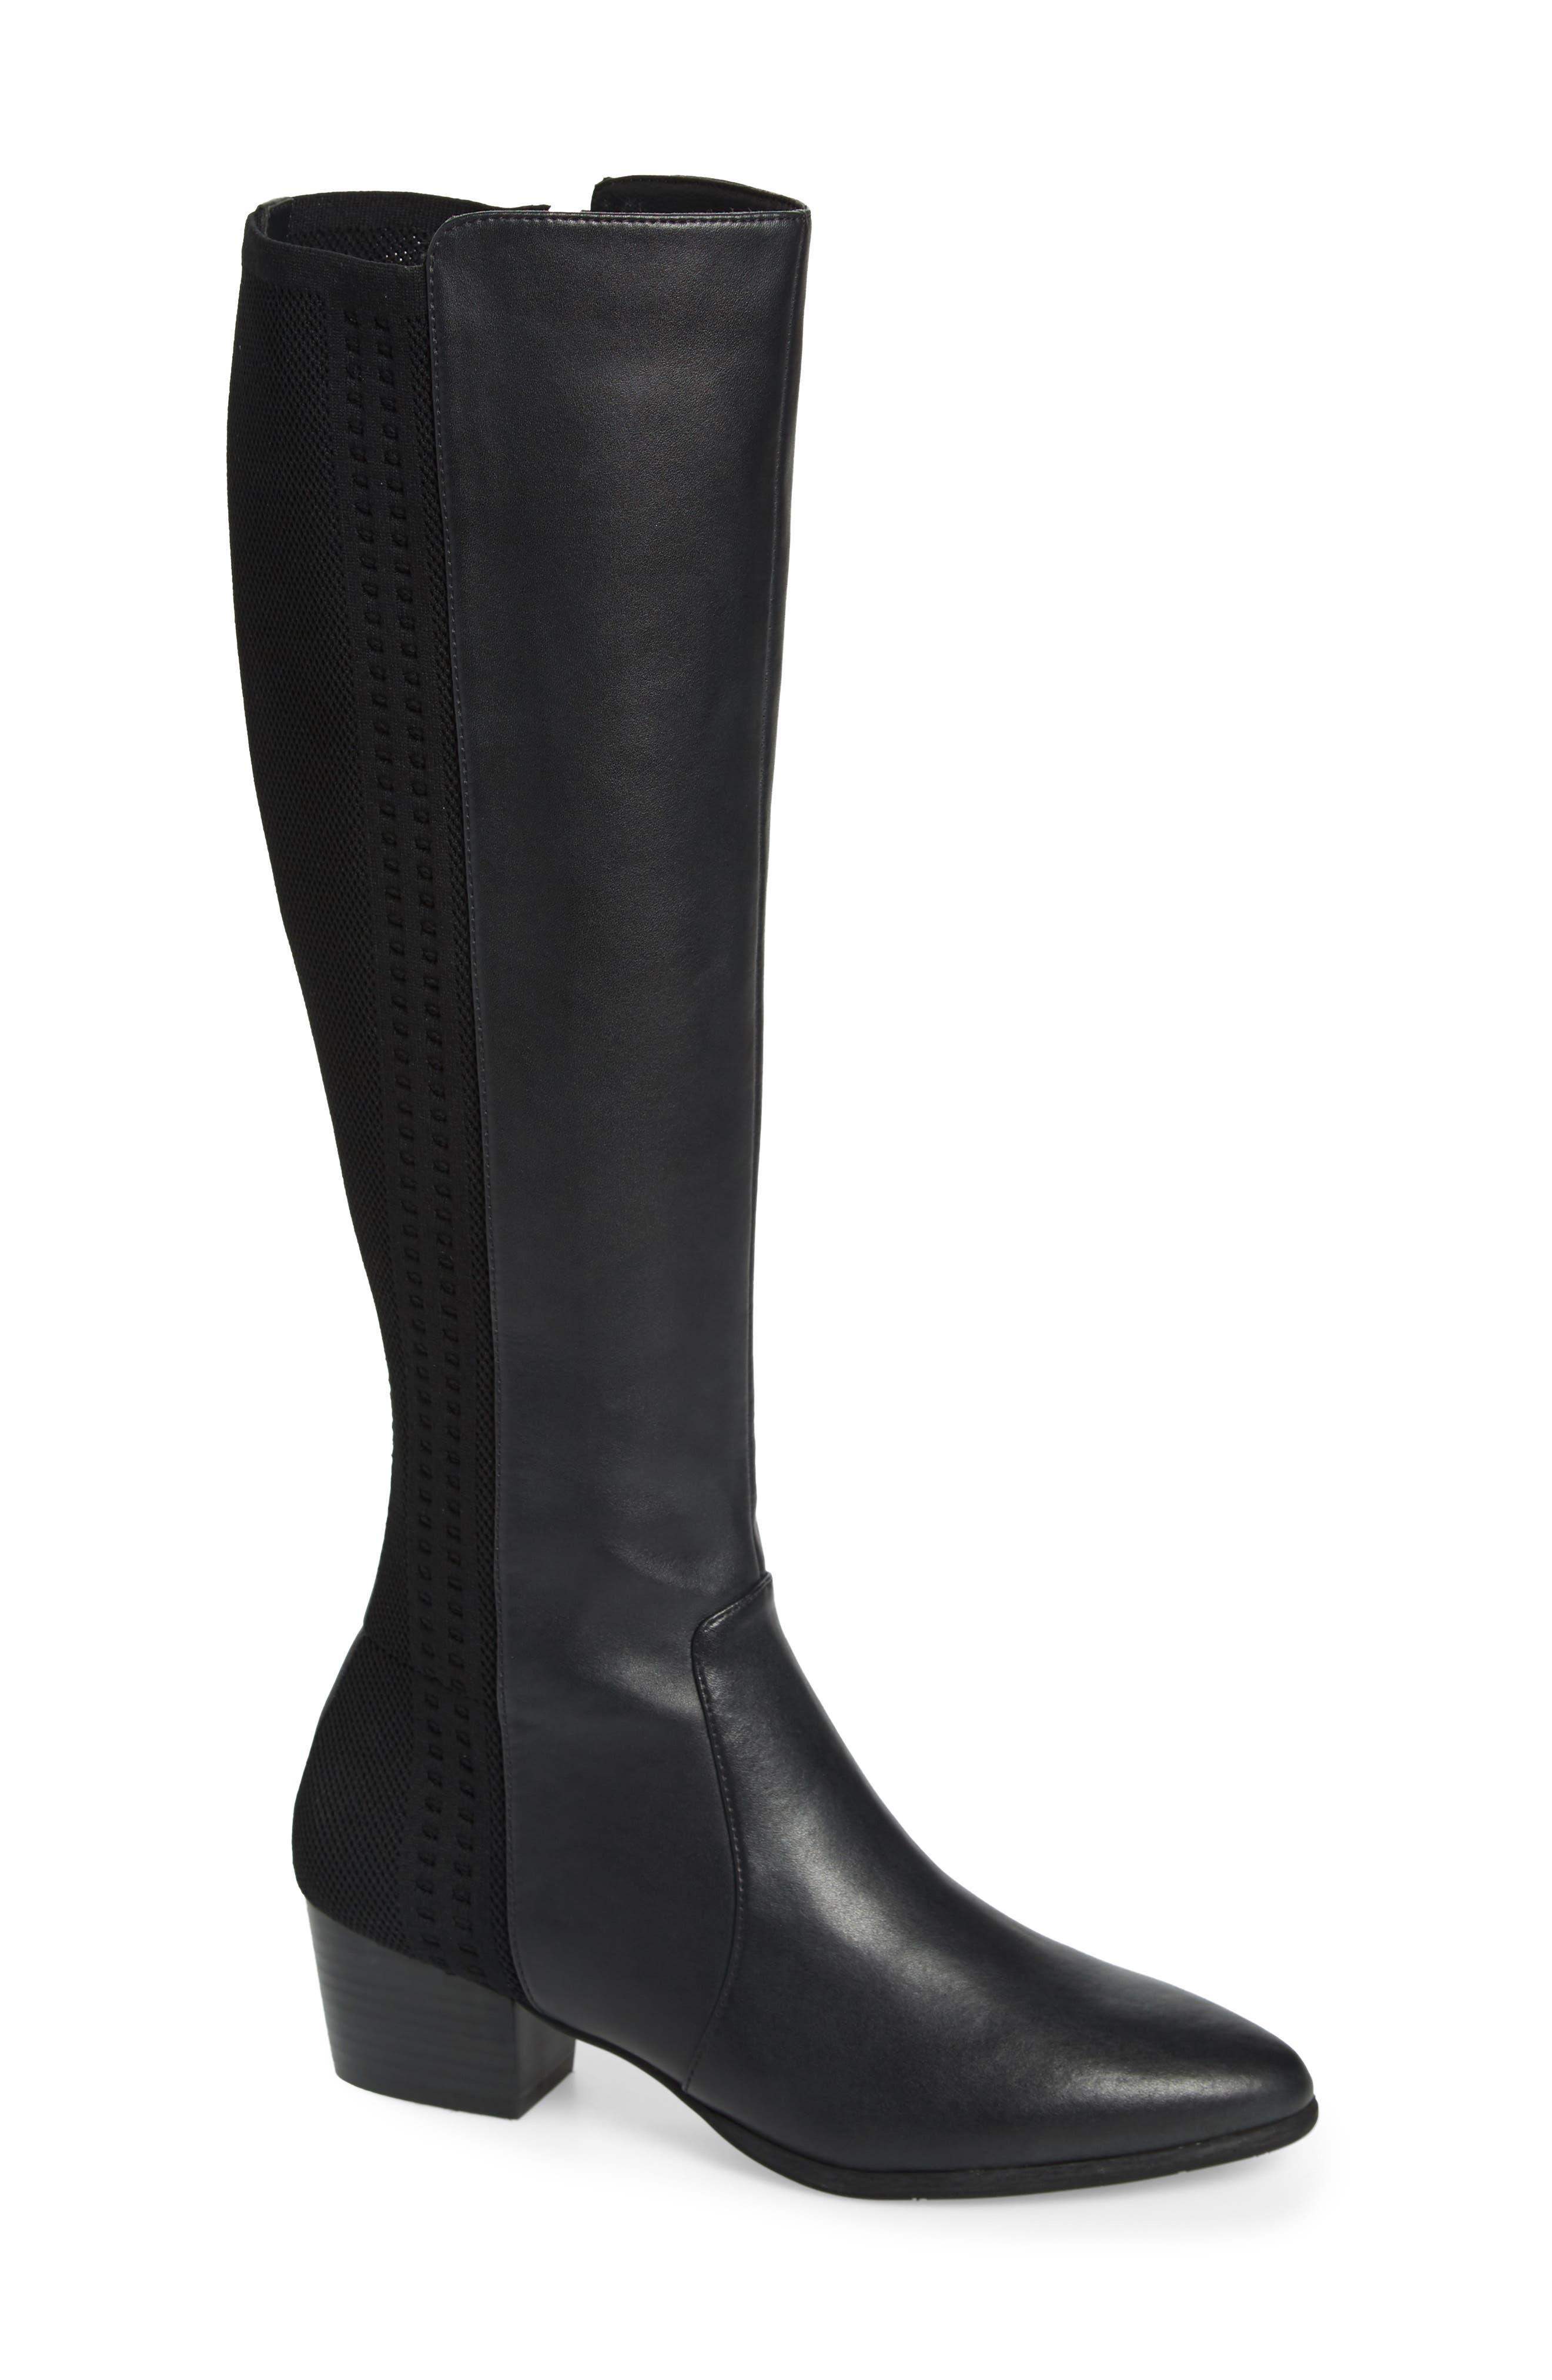 Nic + Zoe Windsor Knee High Boot- Black